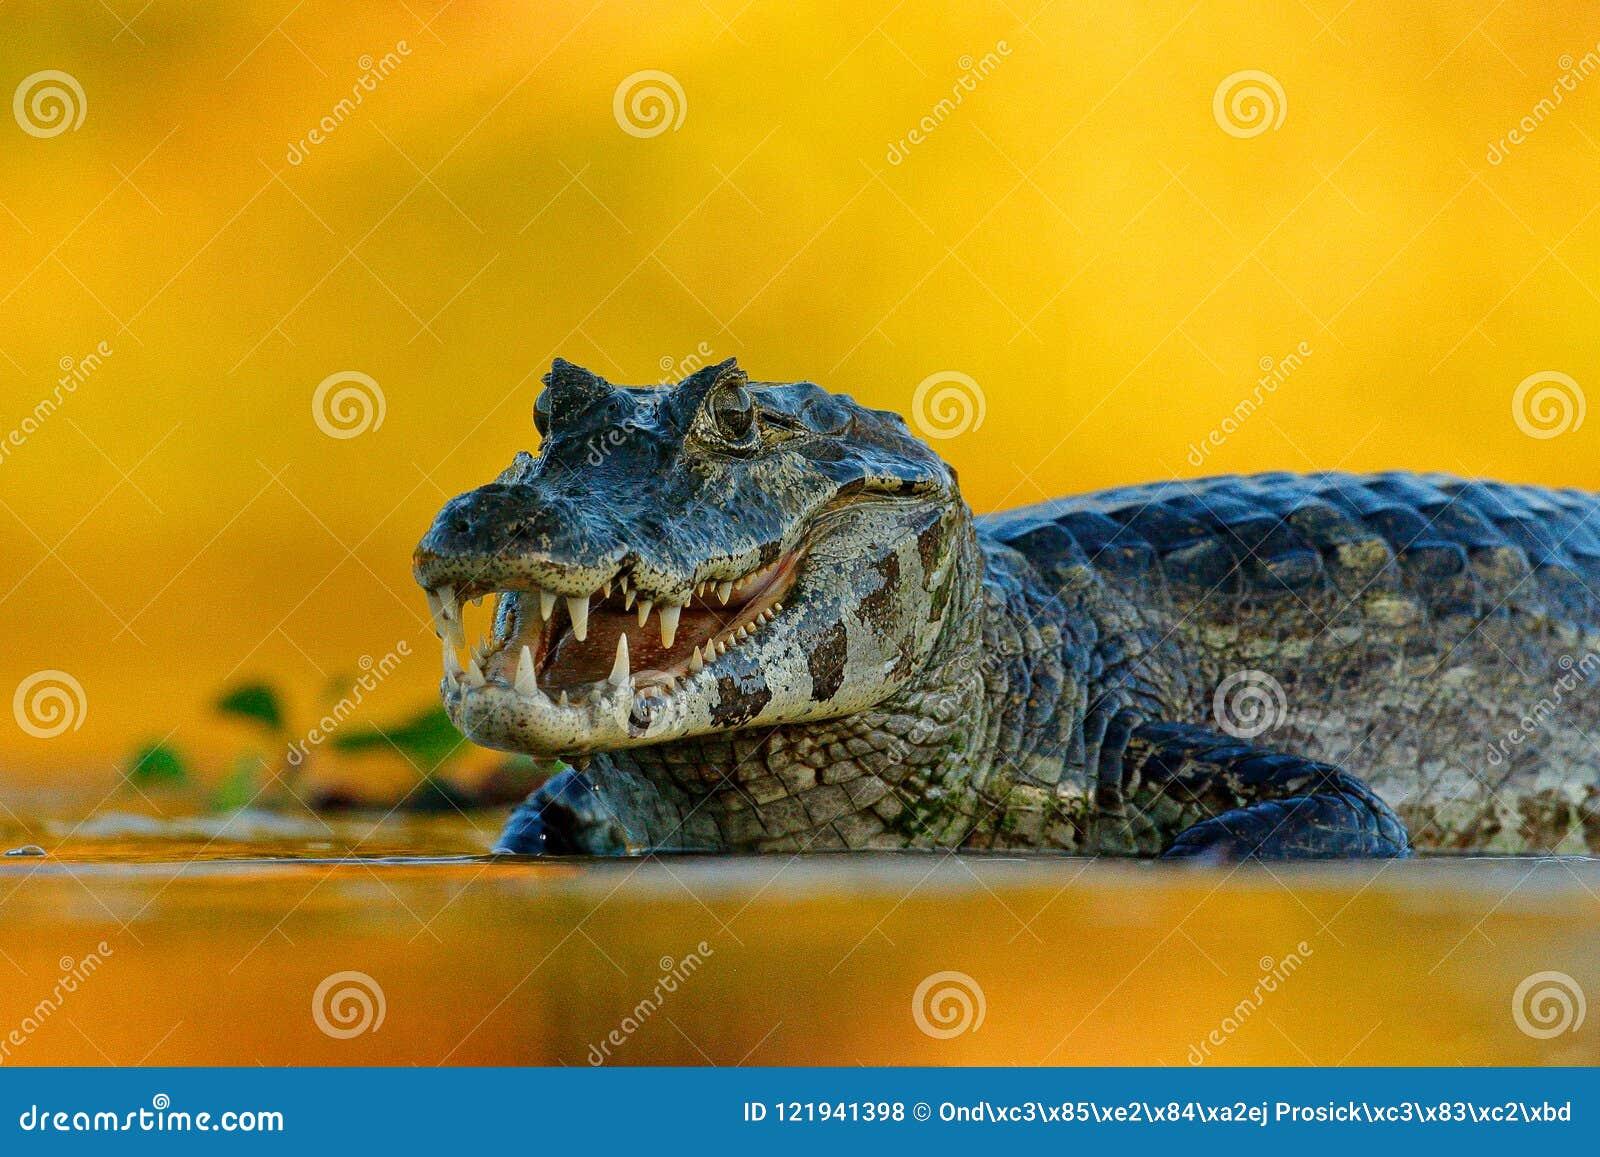 Yacare Caiman, Pantanal, Brazil. Detail portrait of danger reptile. Crocodile in river water, evening light.